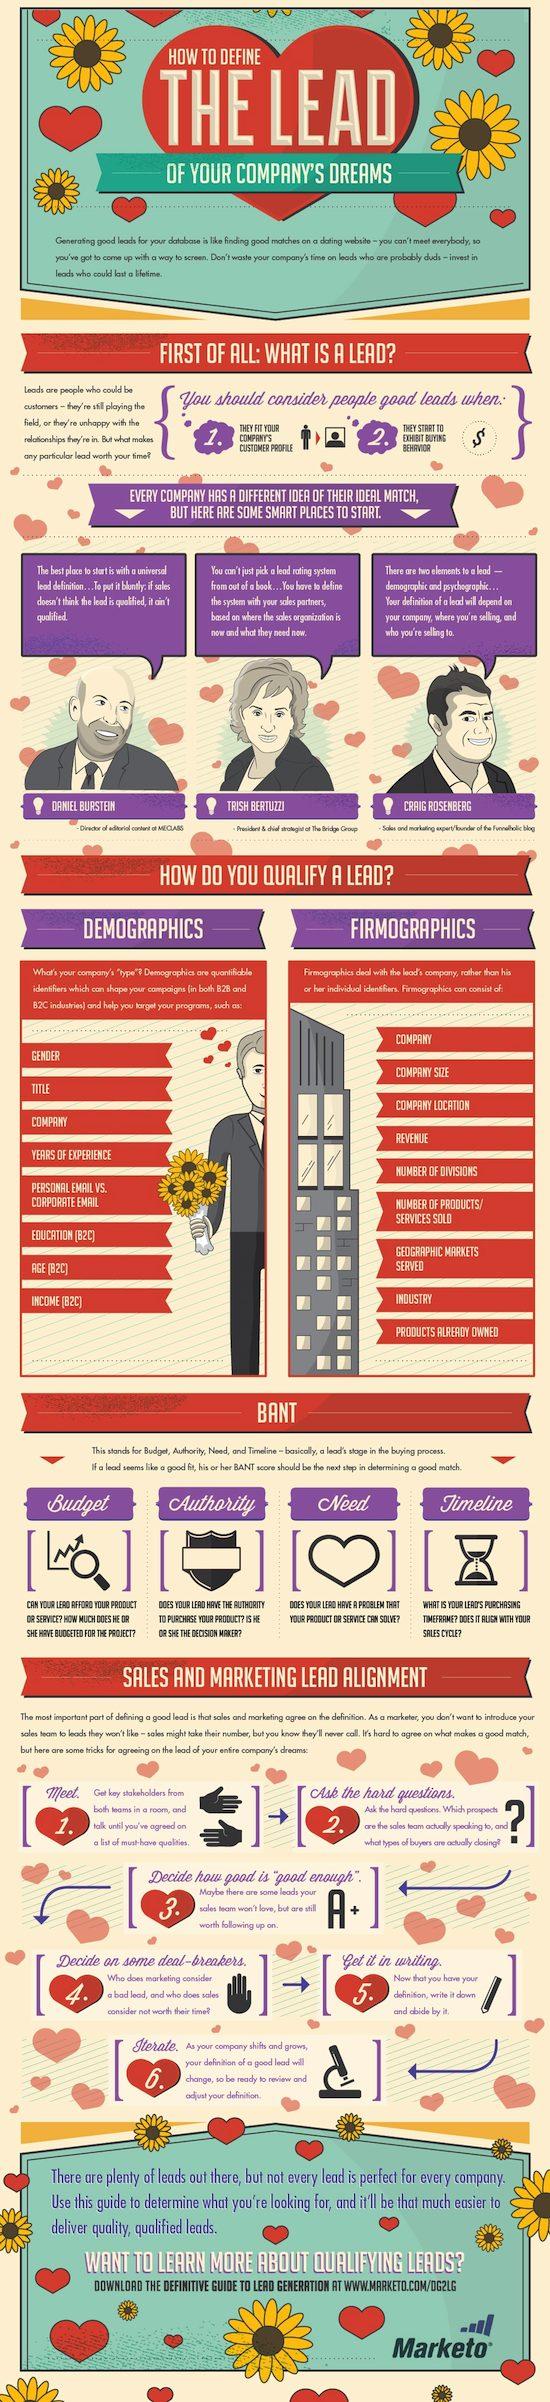 Droom-Lead-b2b-Infographic